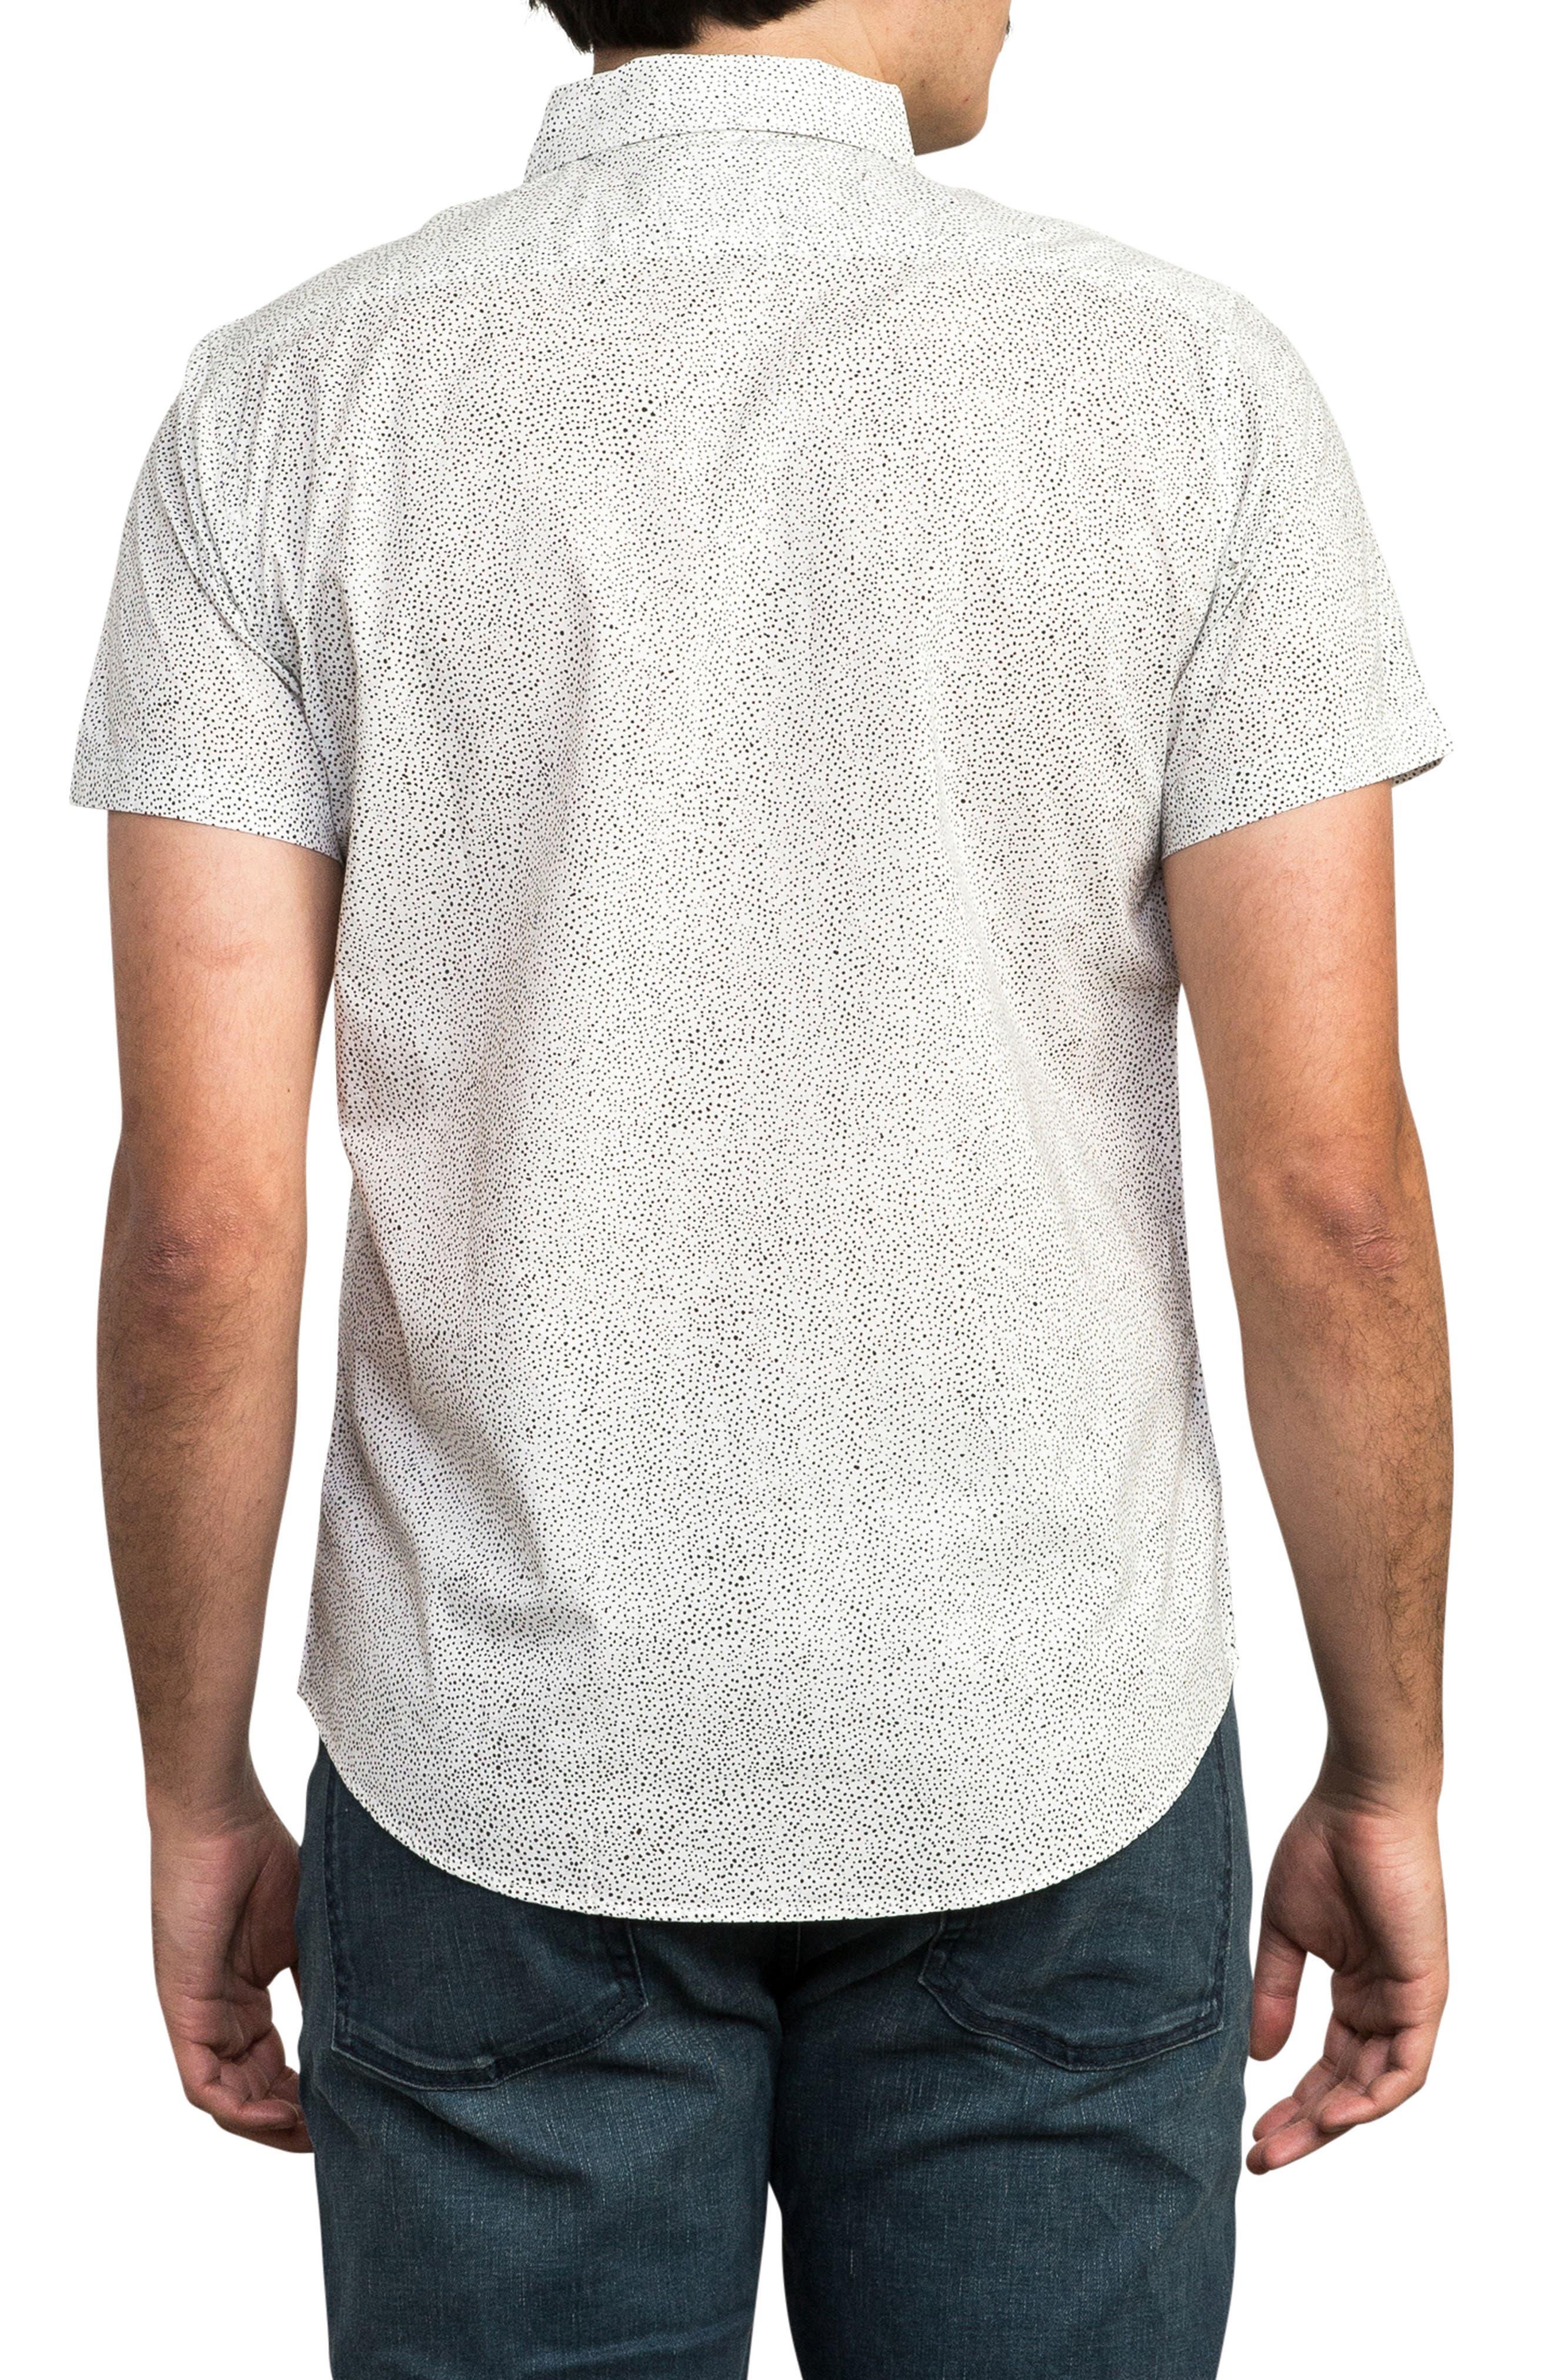 Benji Short Sleeve Woven Shirt,                             Alternate thumbnail 3, color,                             ANTIQUE WHITE